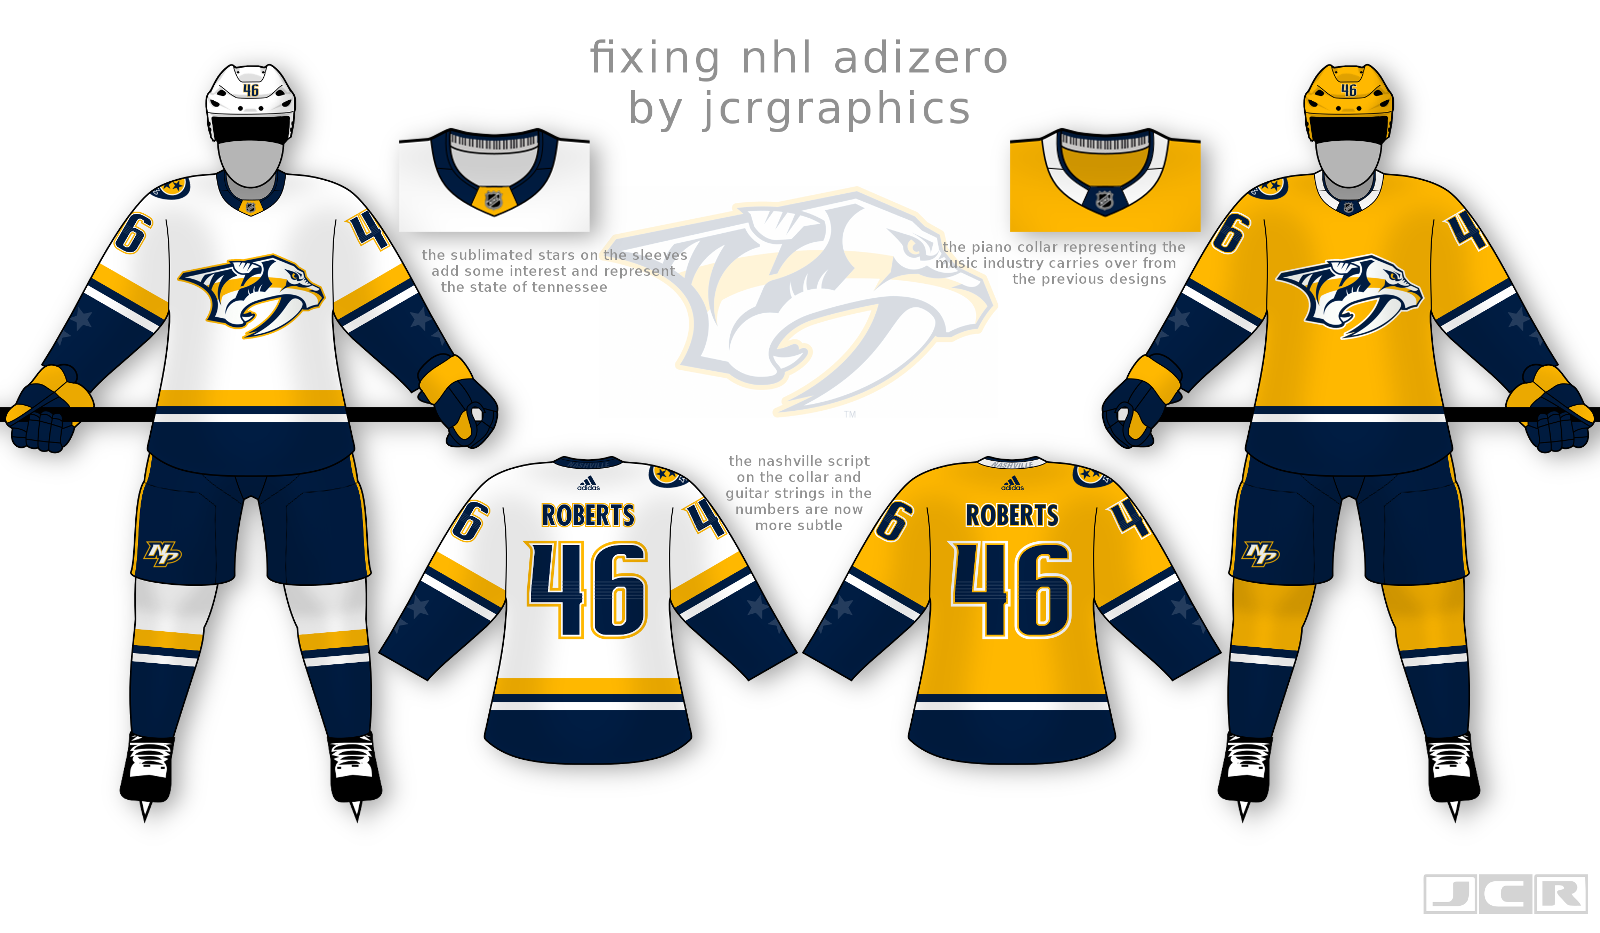 Fixing the Adidas NHL mess - Concepts - Chris Creamer s Sports Logos ... 9ae0f2ea6